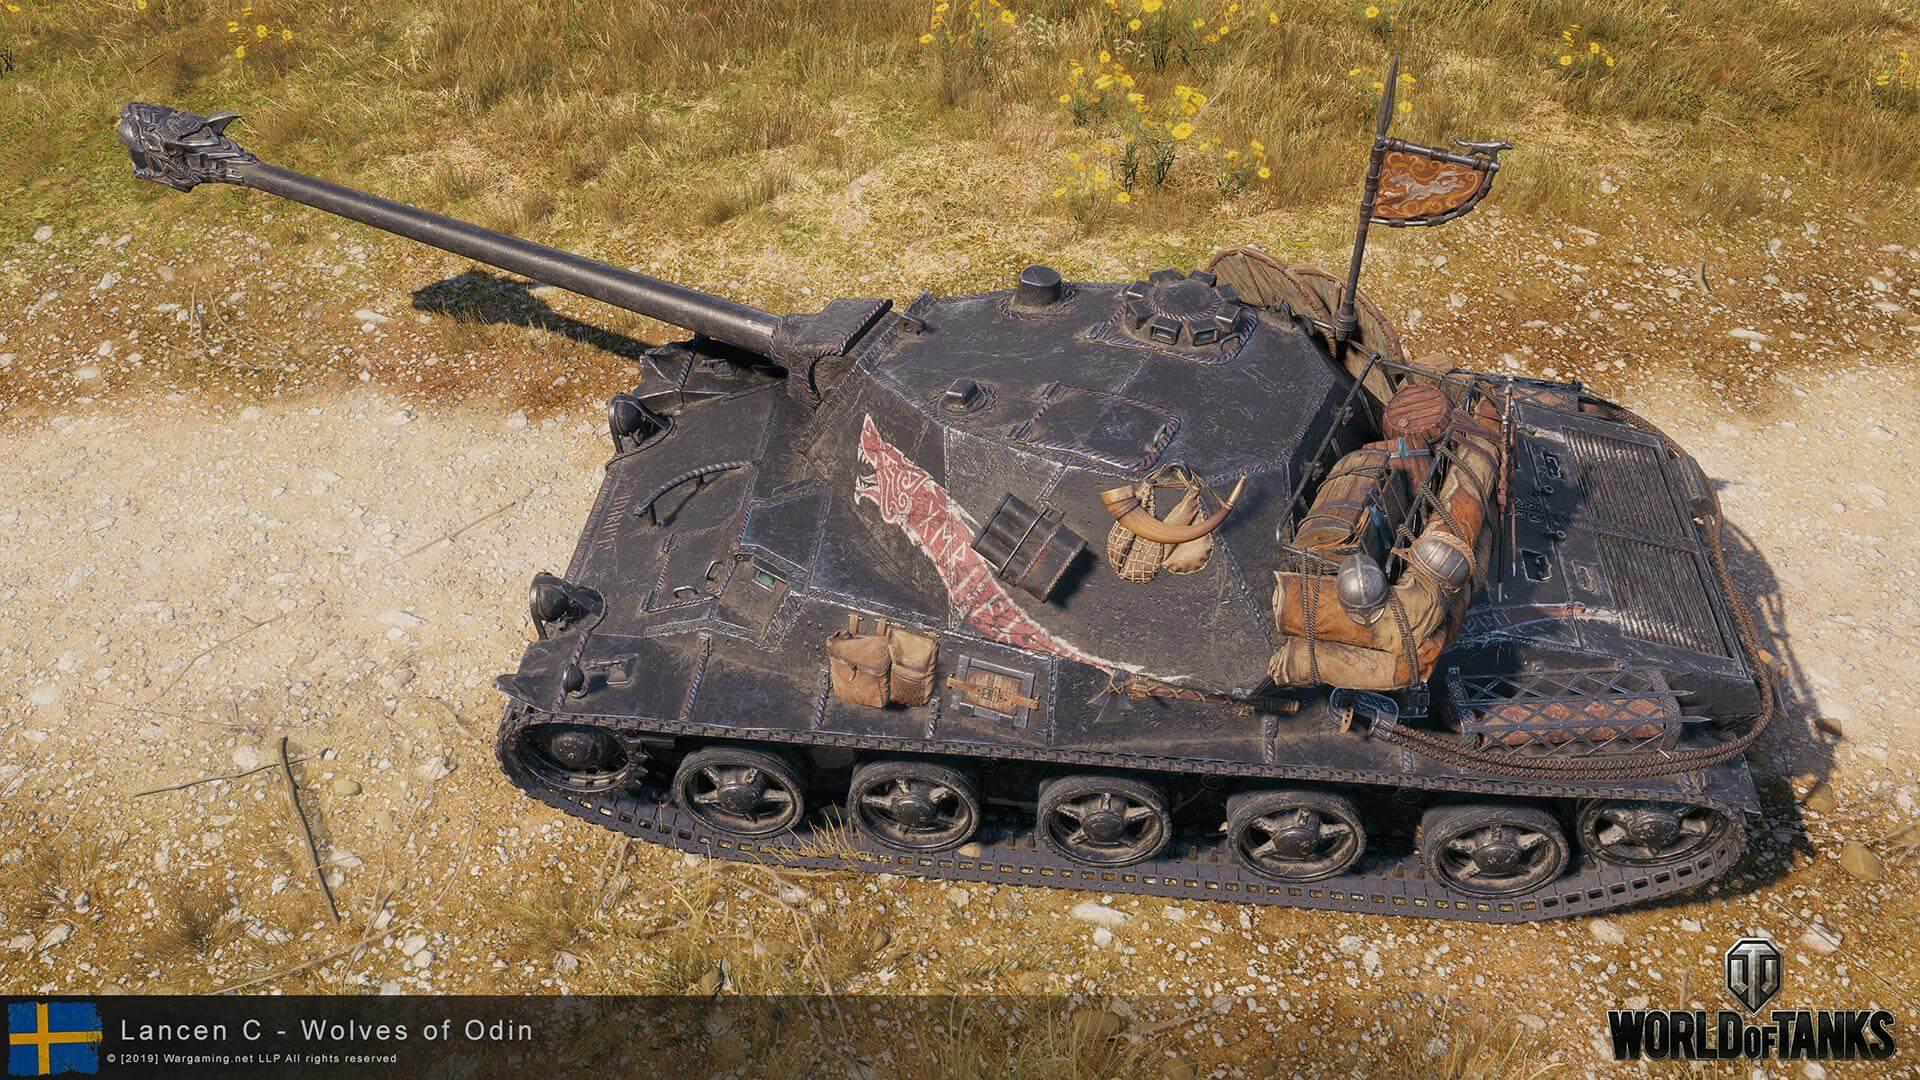 Special Pre Sale Offer Lansen C Premium Shop Offers World Of Tanks